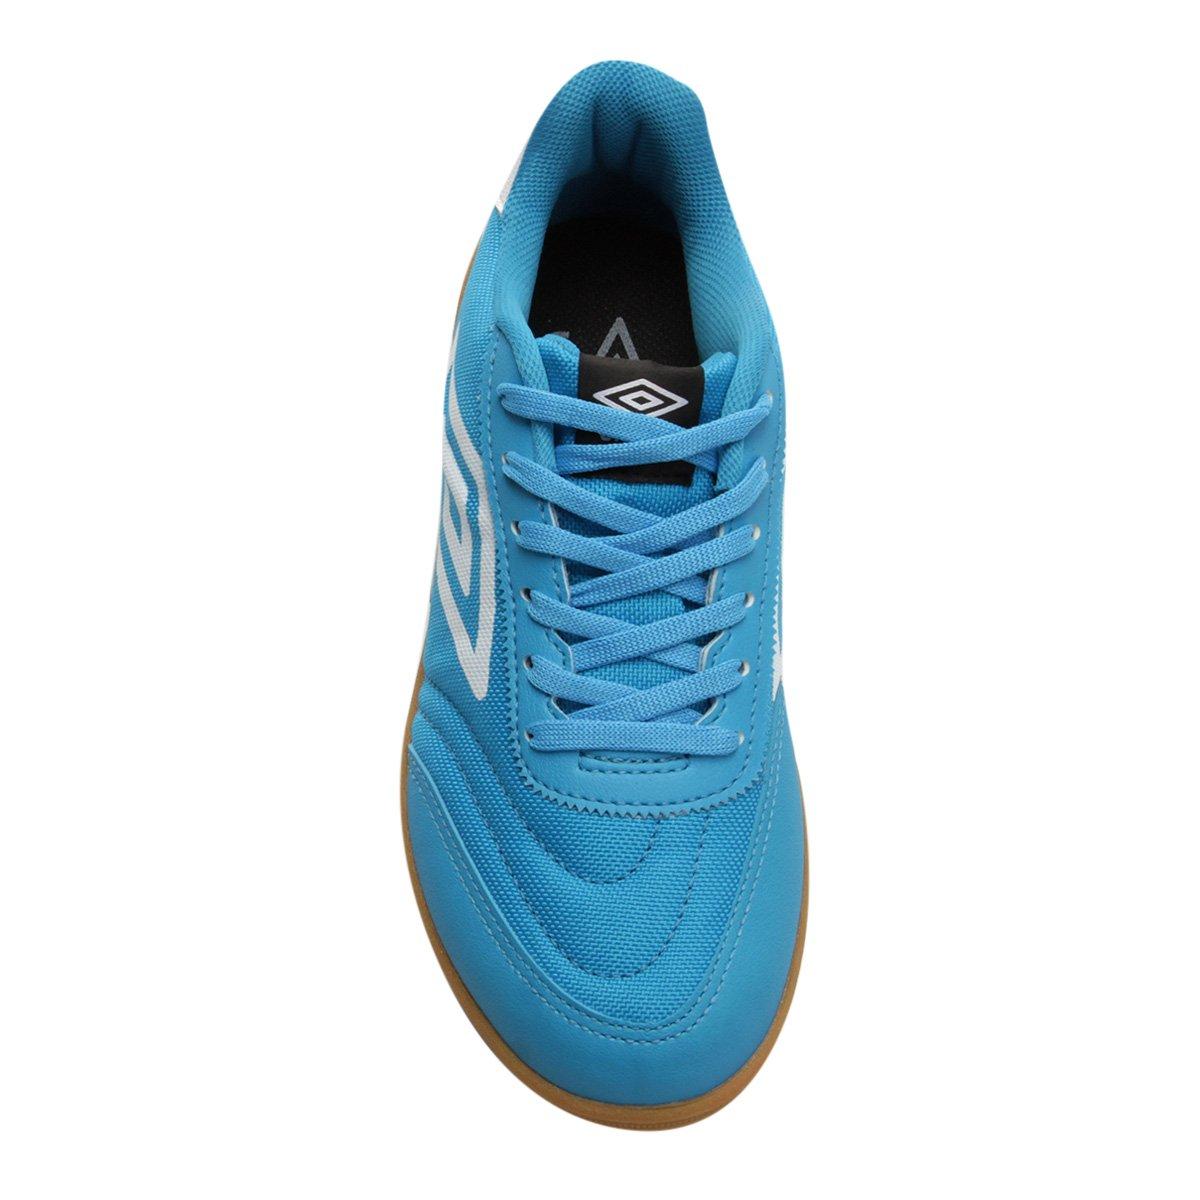 Fiber e Umbro Azul Masculina Futsal Branco Chuteira Futsal Chuteira 0BPq6HI